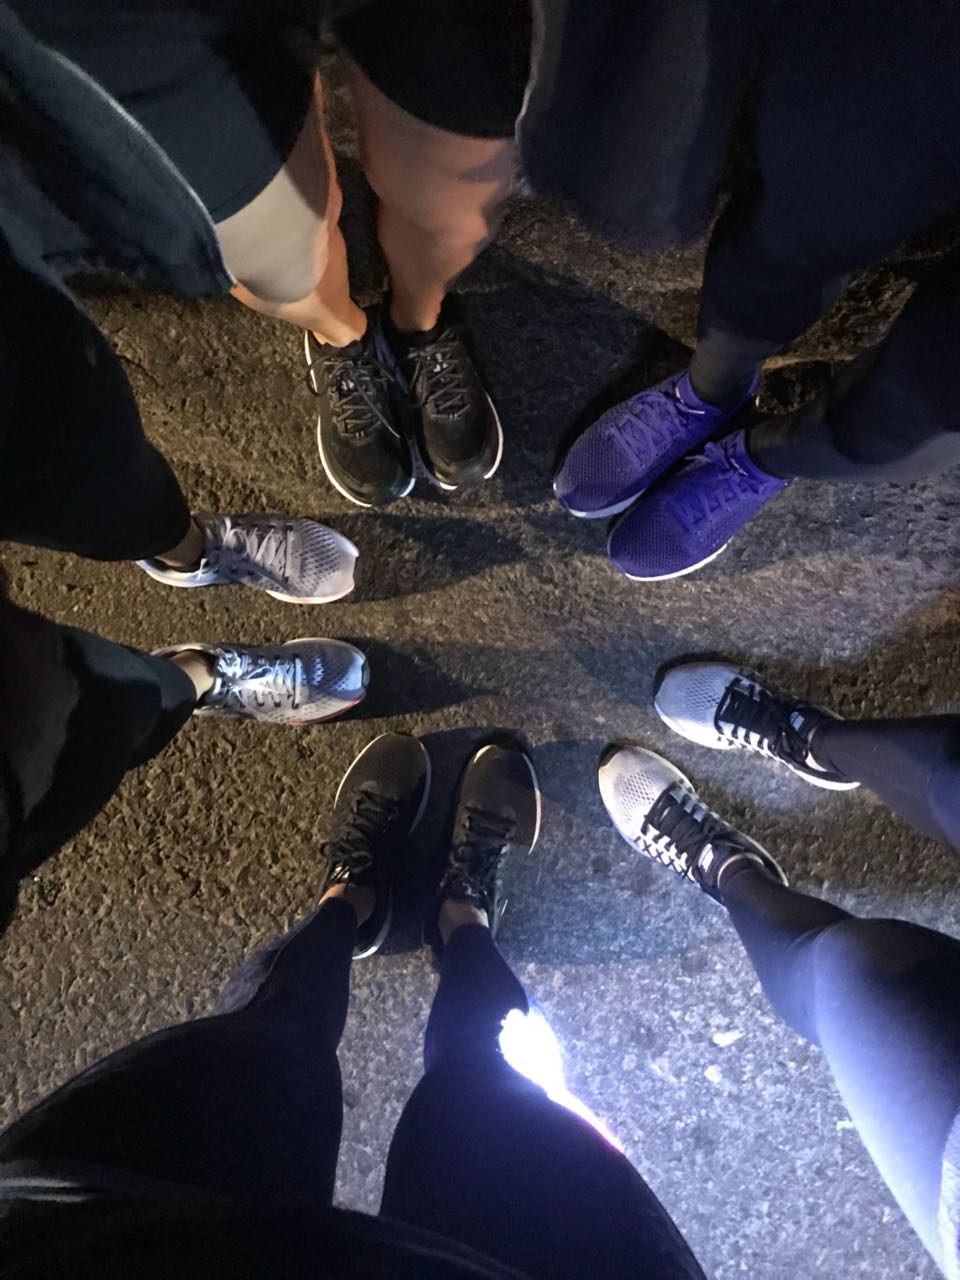 PHOTO-2018-02-17-15-34-56.jpg